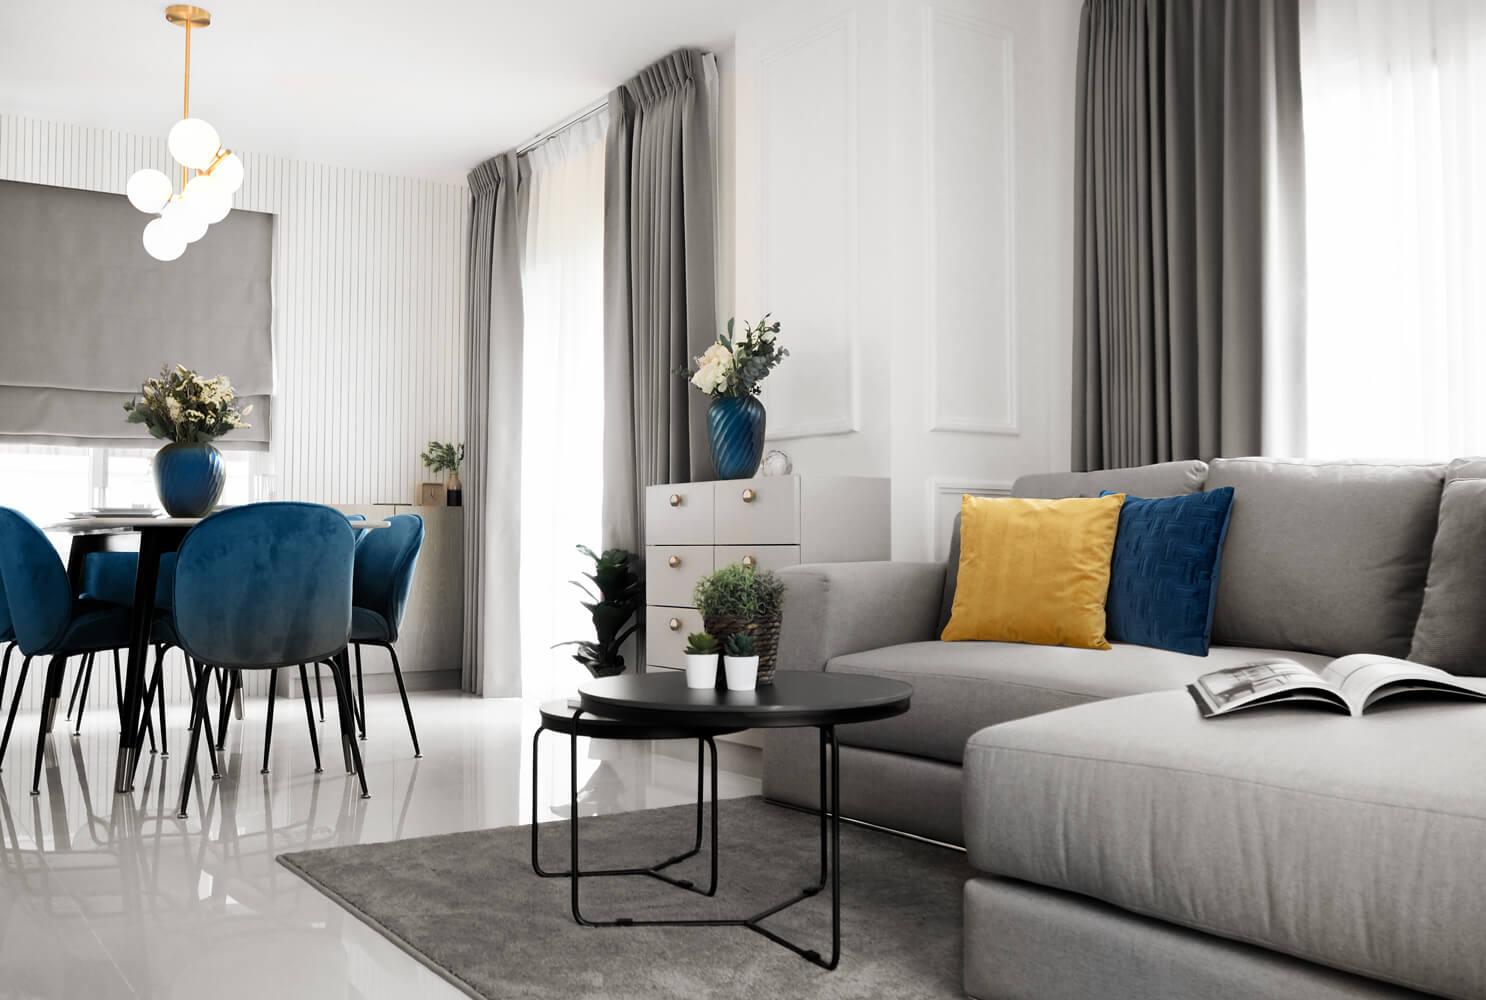 Jakie kolory pasują do szarej kanapy?